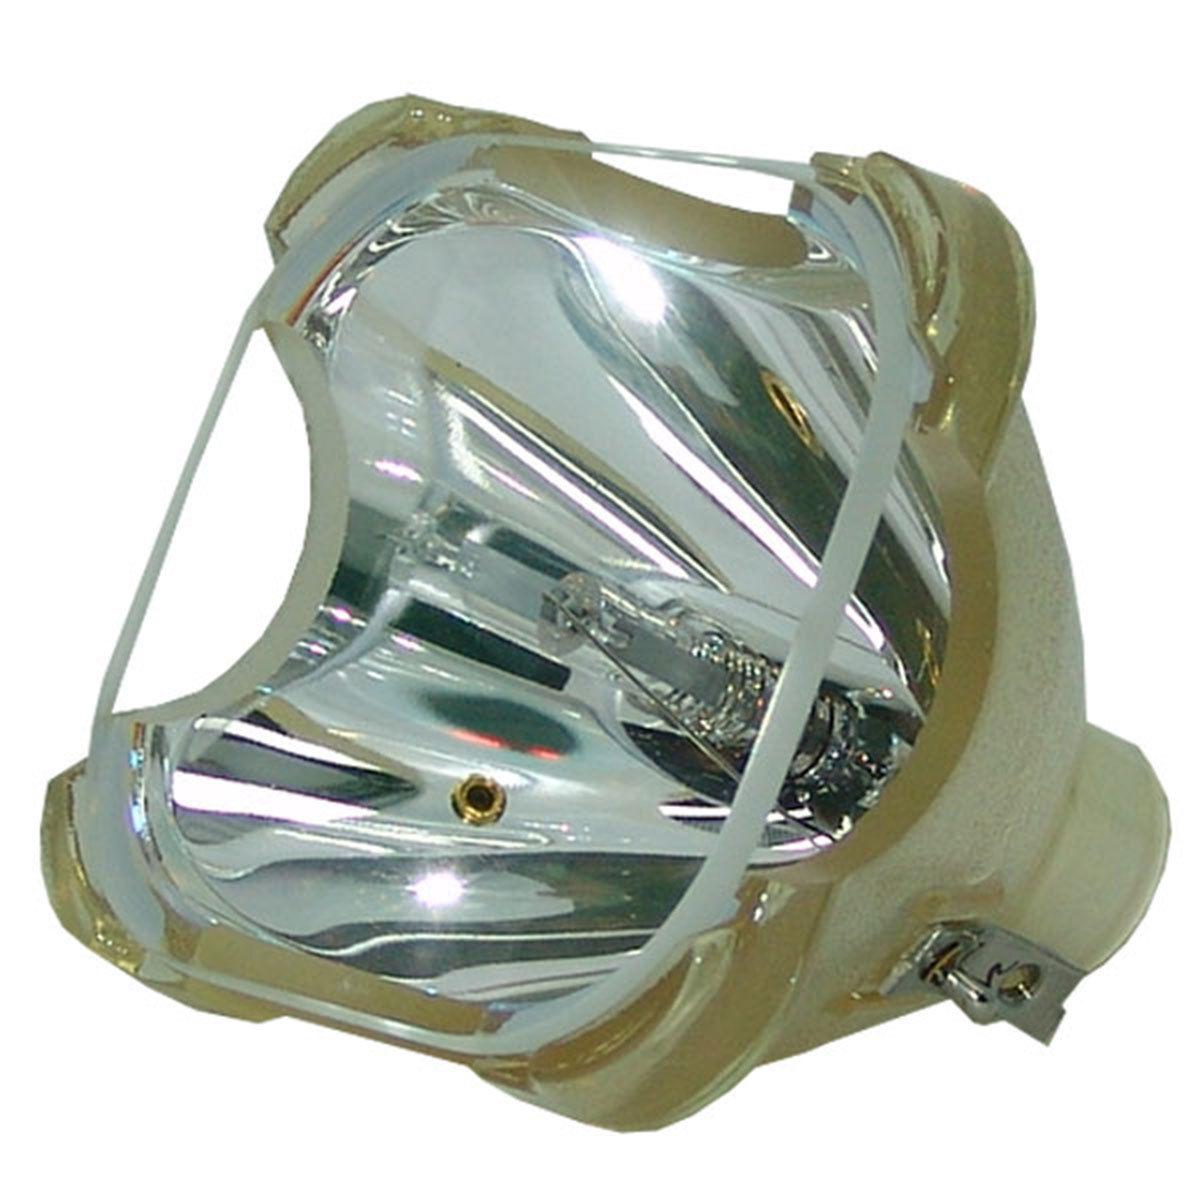 Compatible Bare Bulb LMP-H202 LMPH202 for SONY VPL-HW30AES VPL-HW30ES VPL-HW50ES Projector Lamp Bulb without housing original replacement projector lamp bulb lmp f272 for sony vpl fx35 vpl fh30 vpl fh35 vpl fh31 projector nsha275w